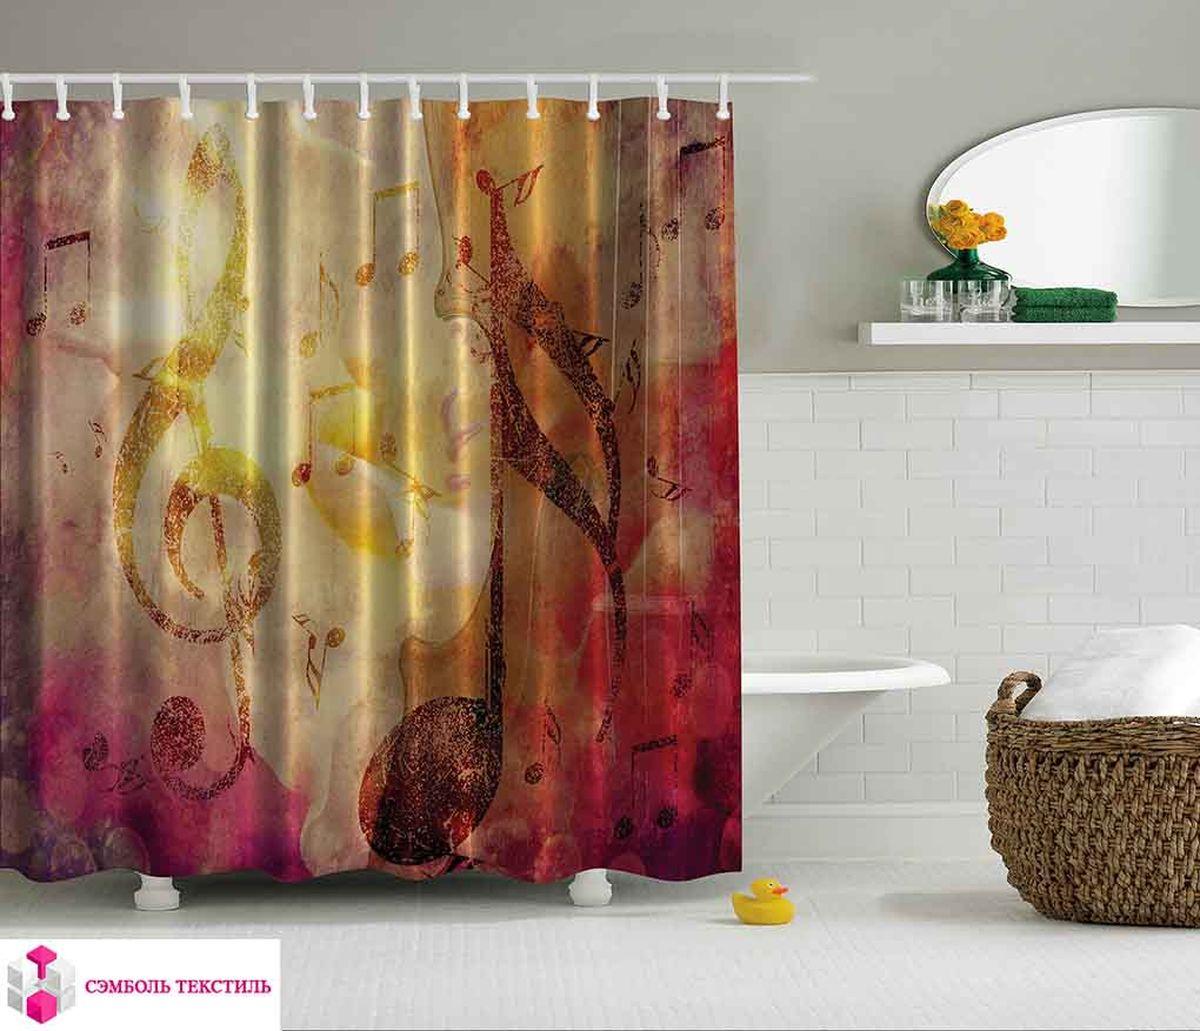 Штора для ванной комнаты Magic Lady Цветомузыка, 180 х 200 см фотоштора для ванной утка принимает душ magic lady 180 х 200 см